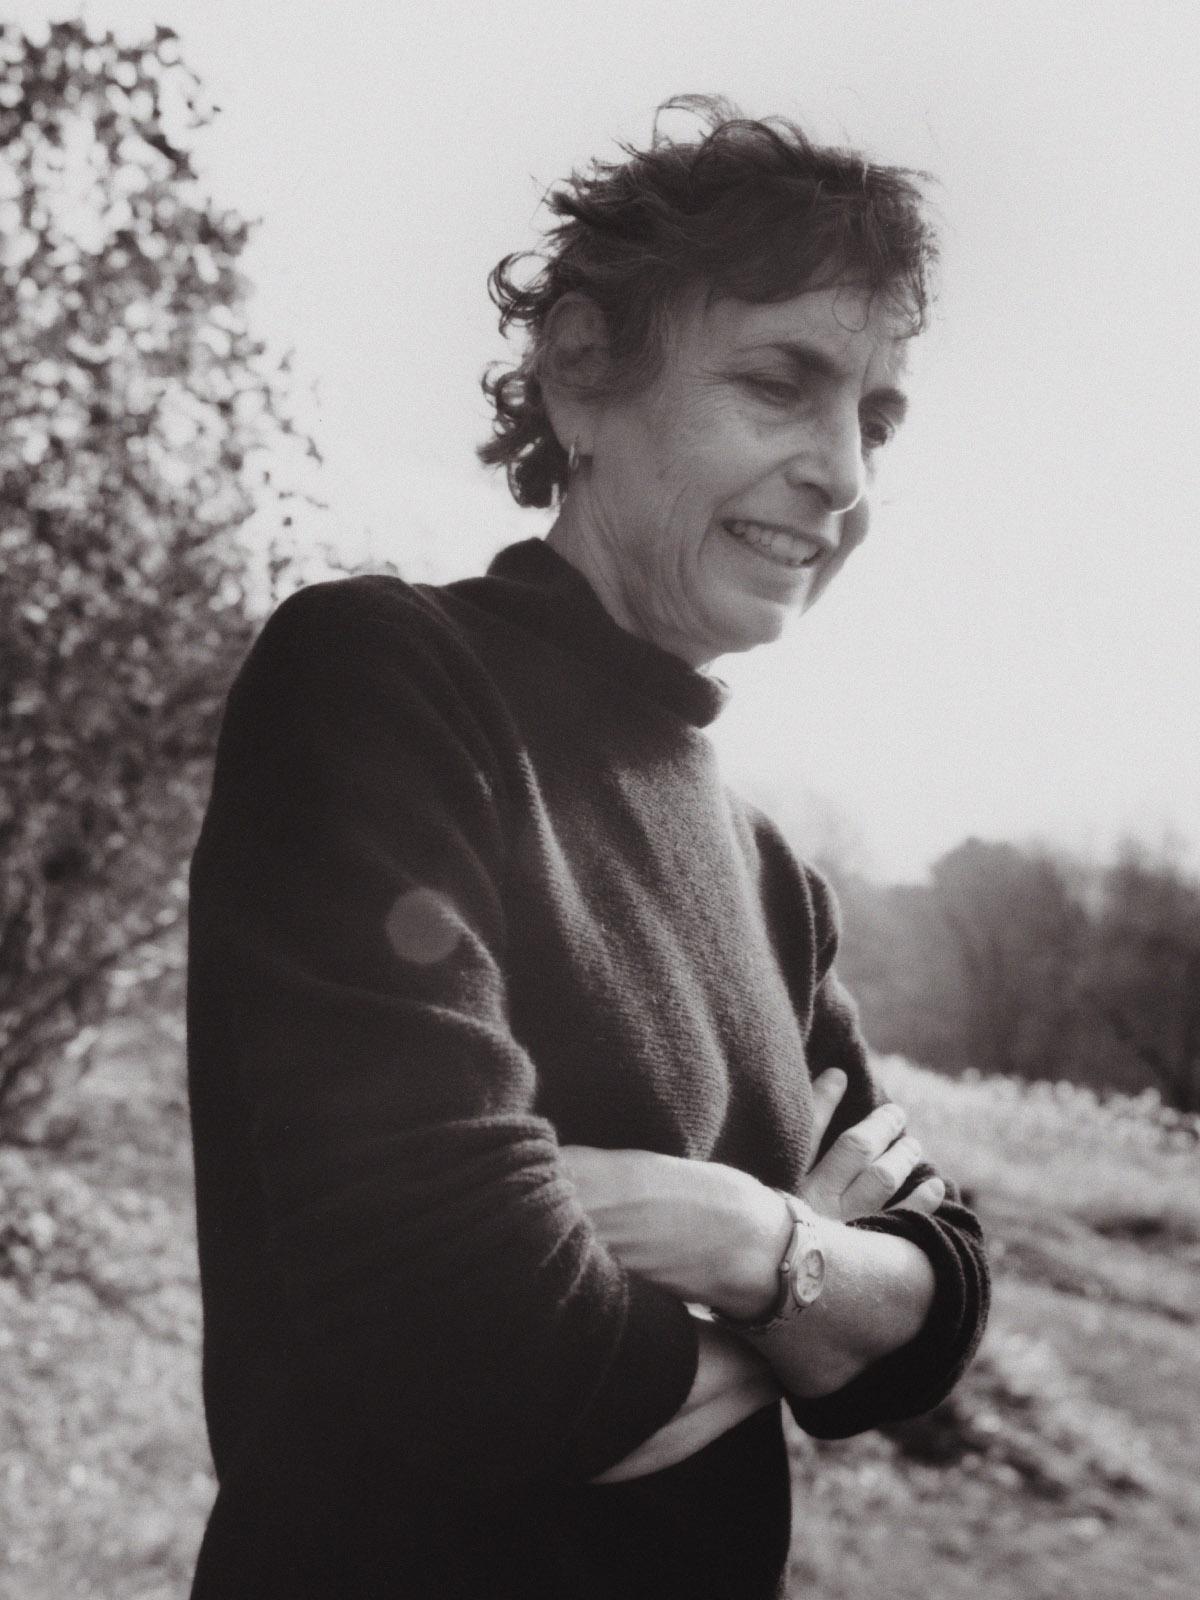 Elizabeth Kolbert looks beyond inconvenient truths to explore ingenious solutions